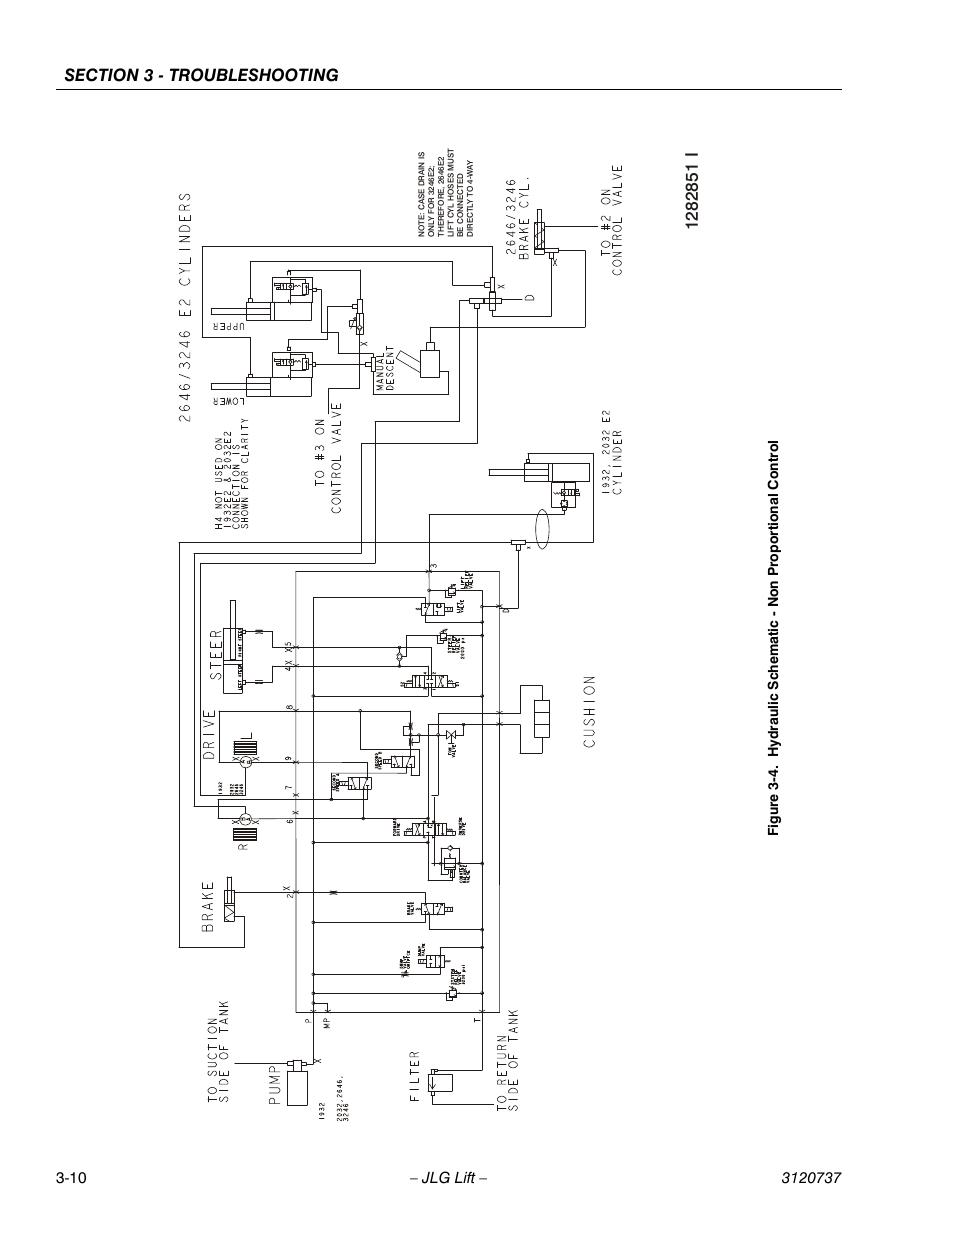 hight resolution of jlg 3246 wiring diagram wiring diagramsjlg 3246 wiring diagram wiring diagram automotivejlg 2032e2 wiring diagram schematic